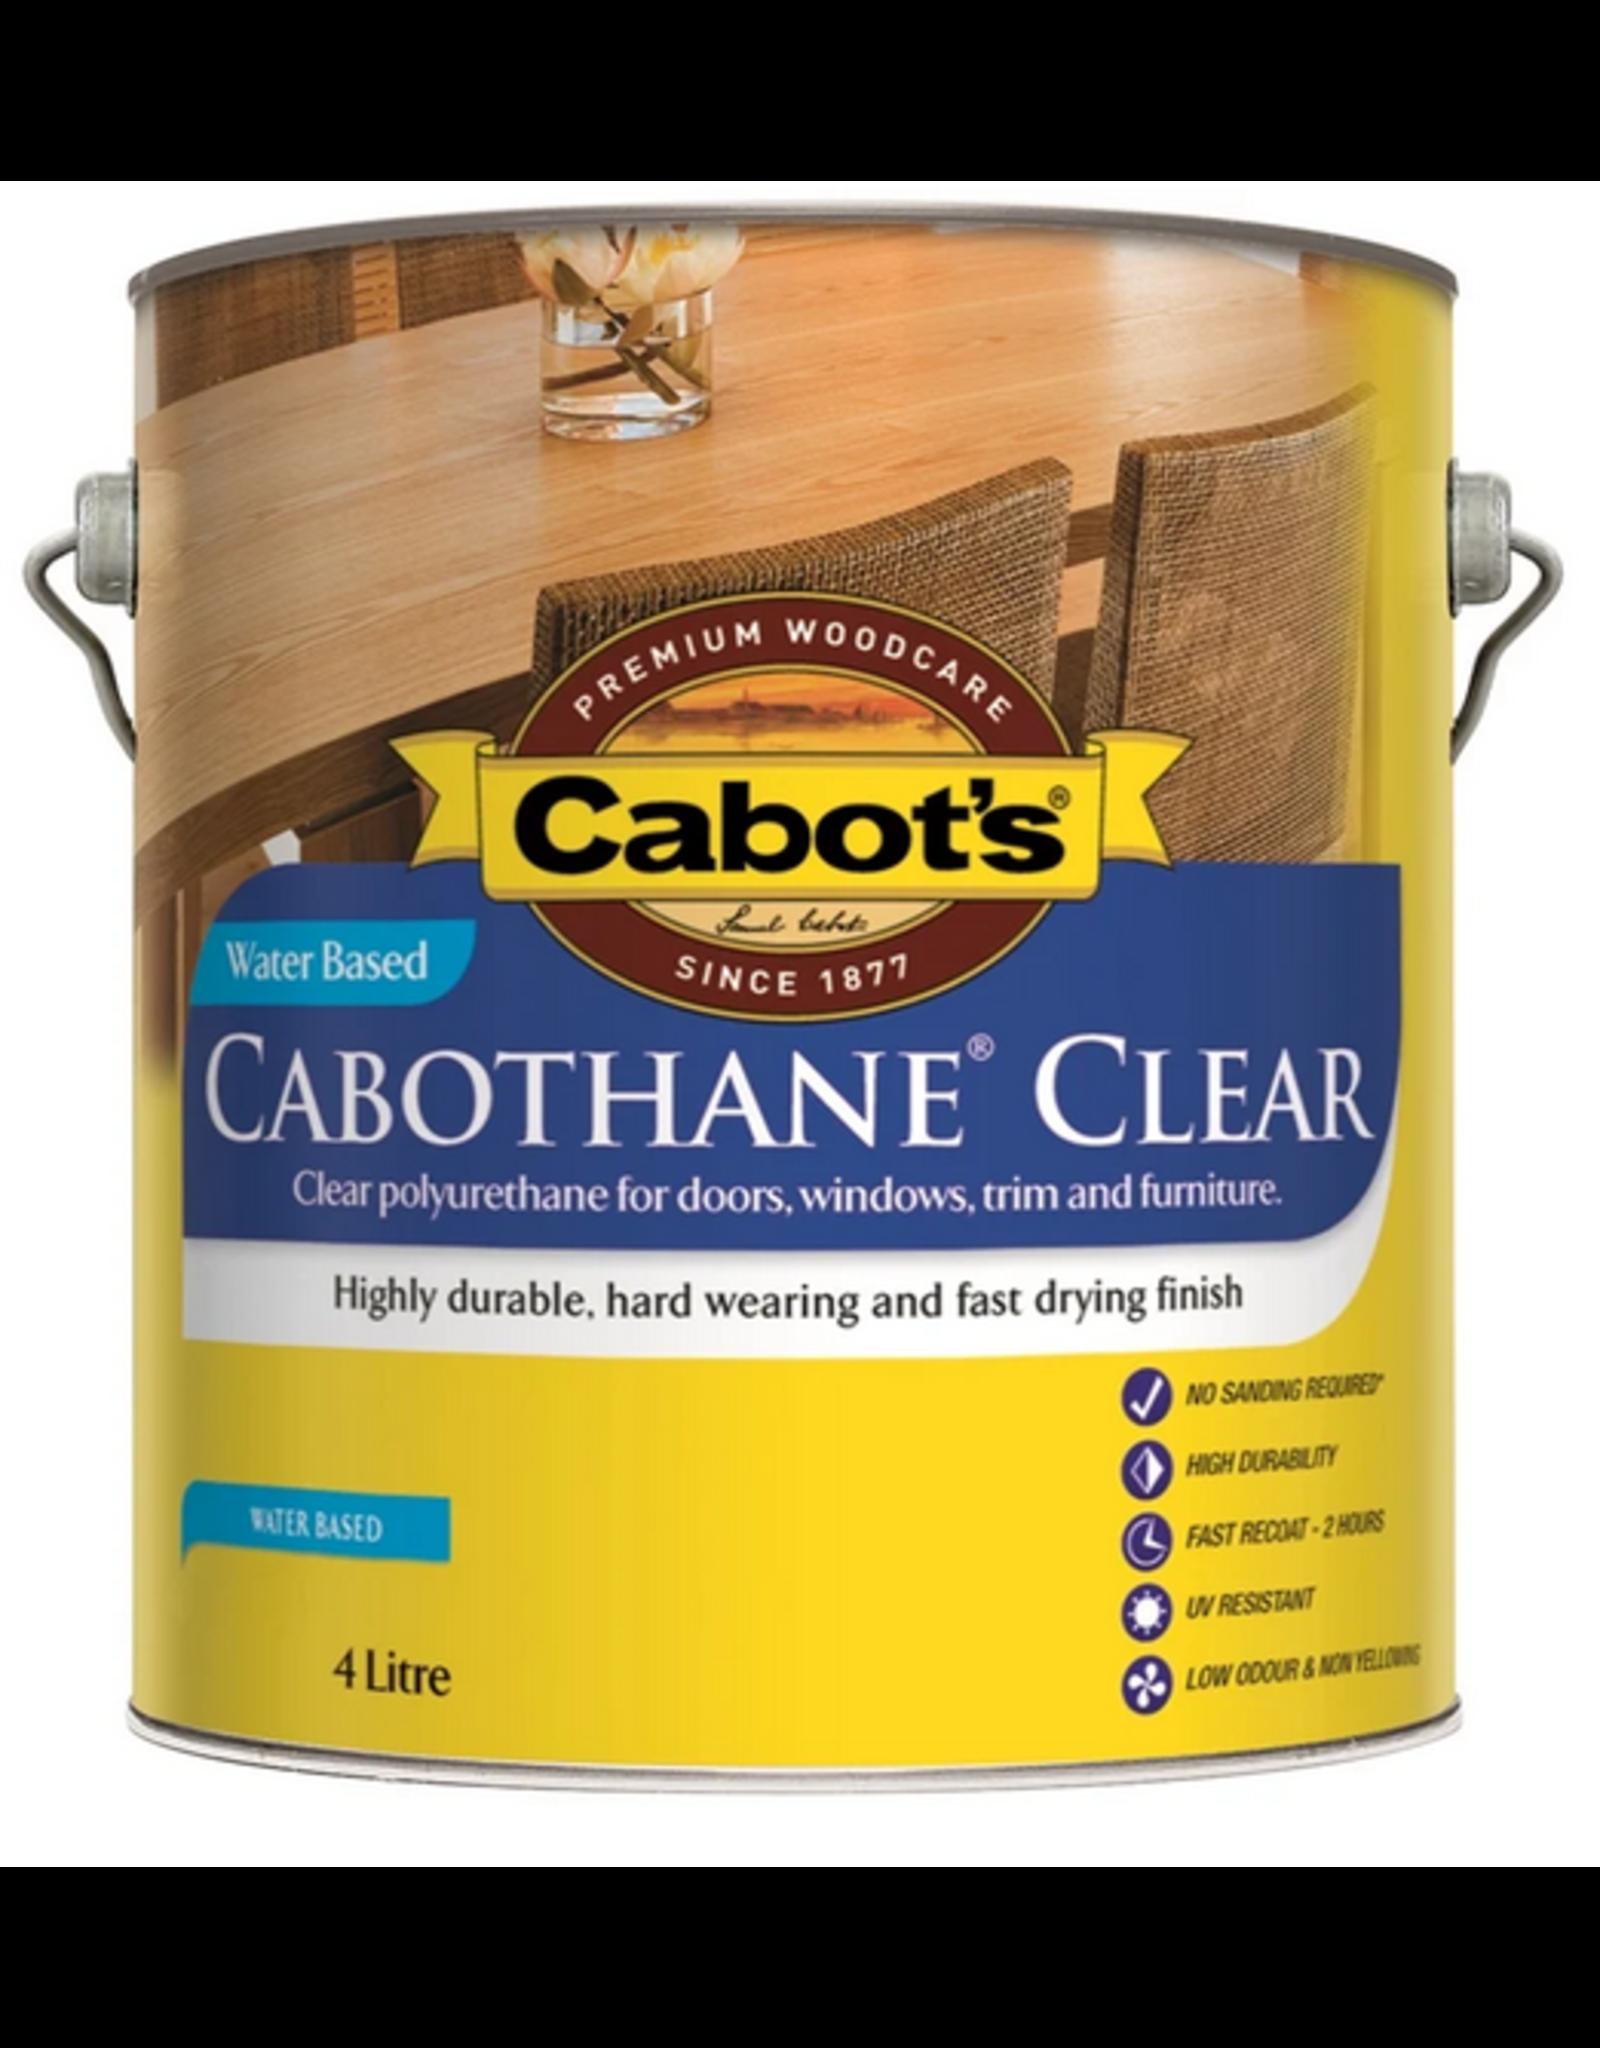 Cabot's Cabot's Cabothane